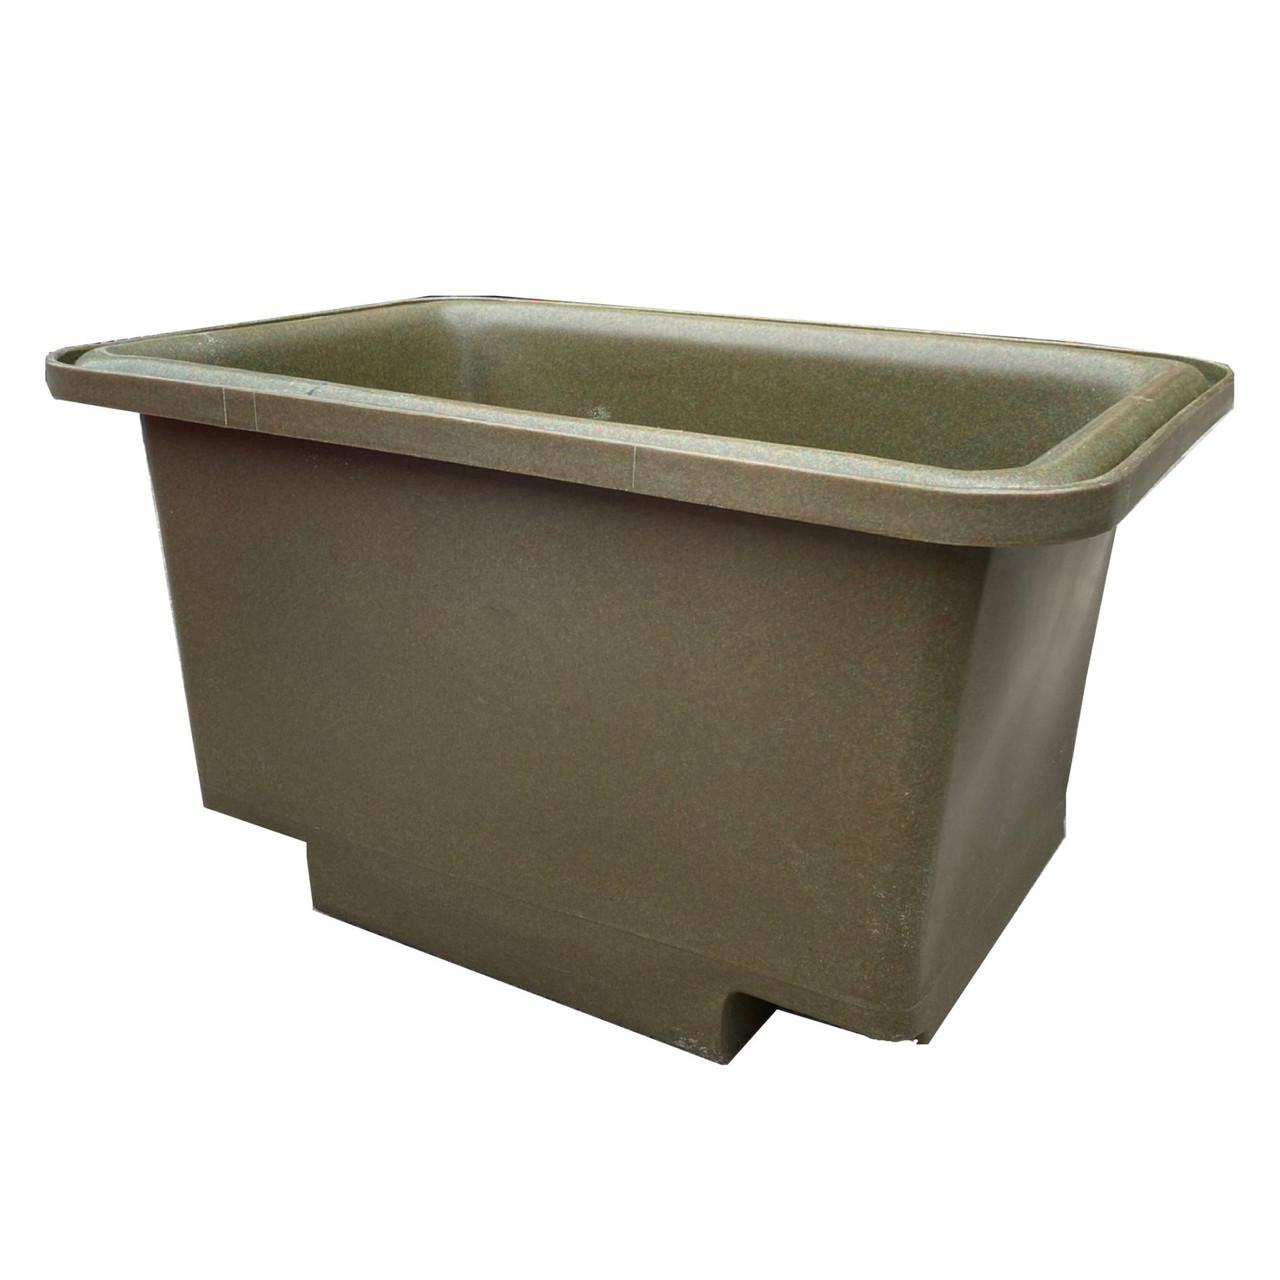 250 Litre recycled forklift mortar tub side on